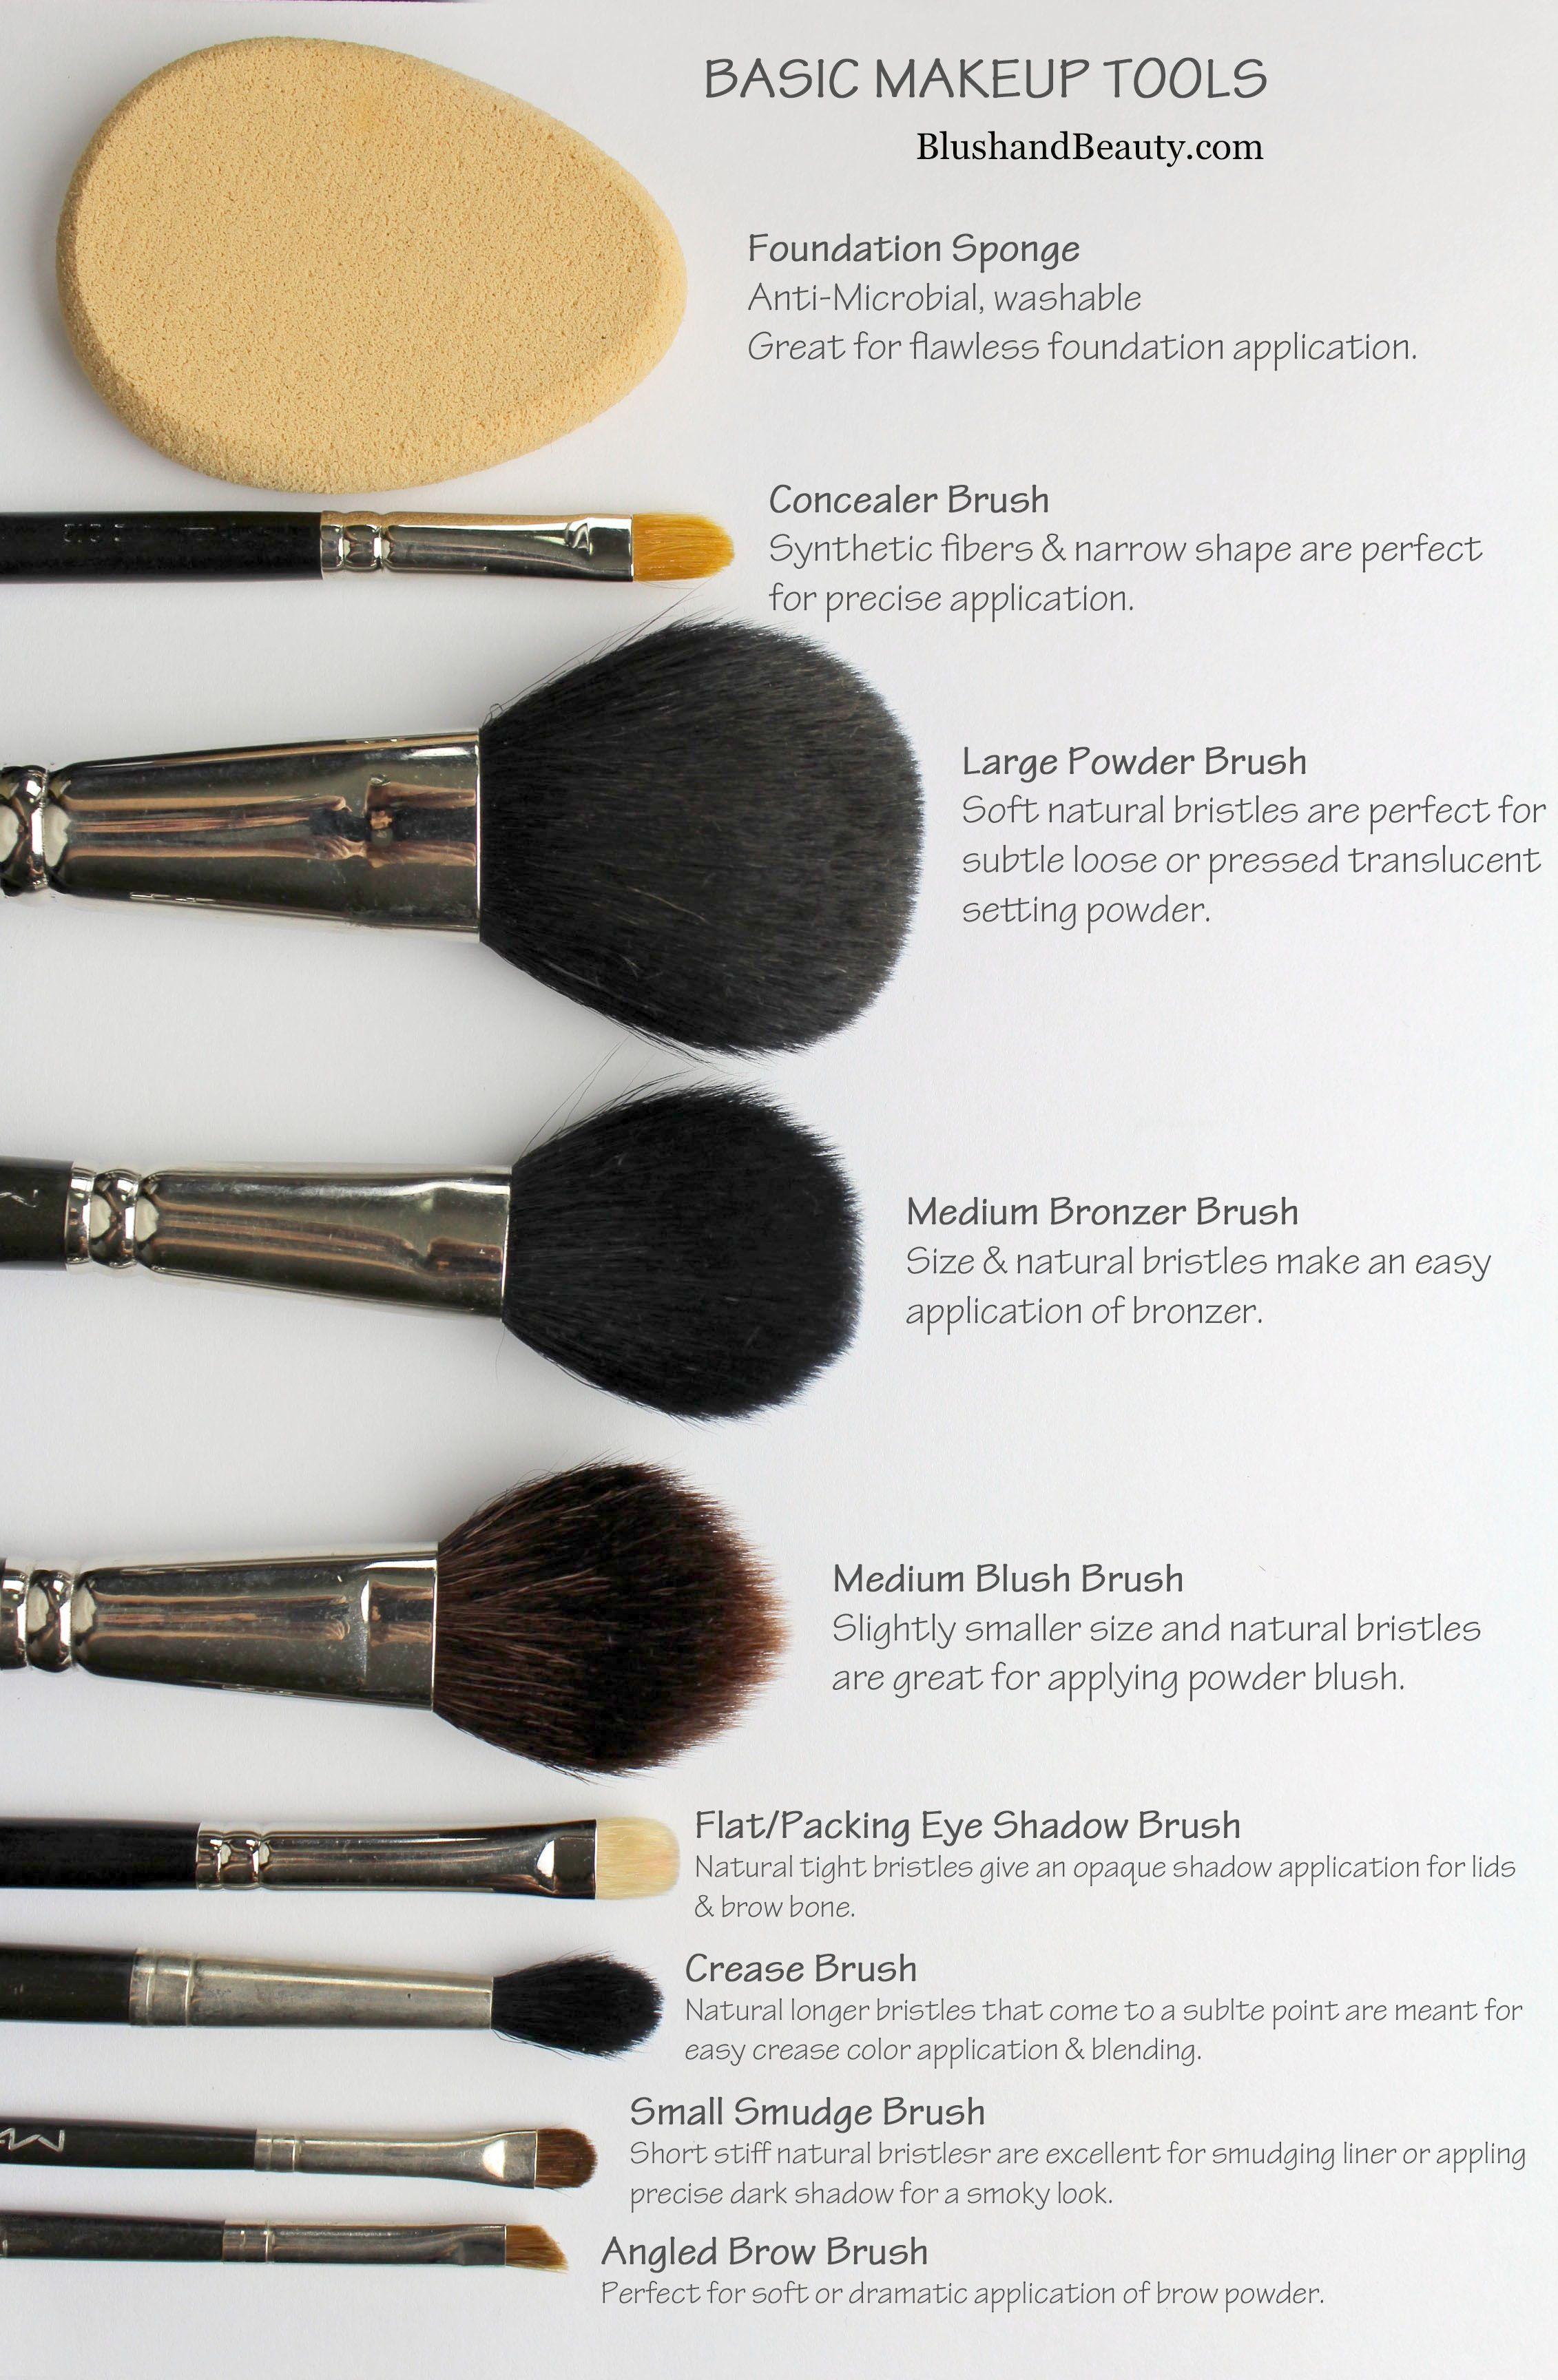 Cool Mac Makeup Brush Must Haves Makeup Brushes Guide Basic